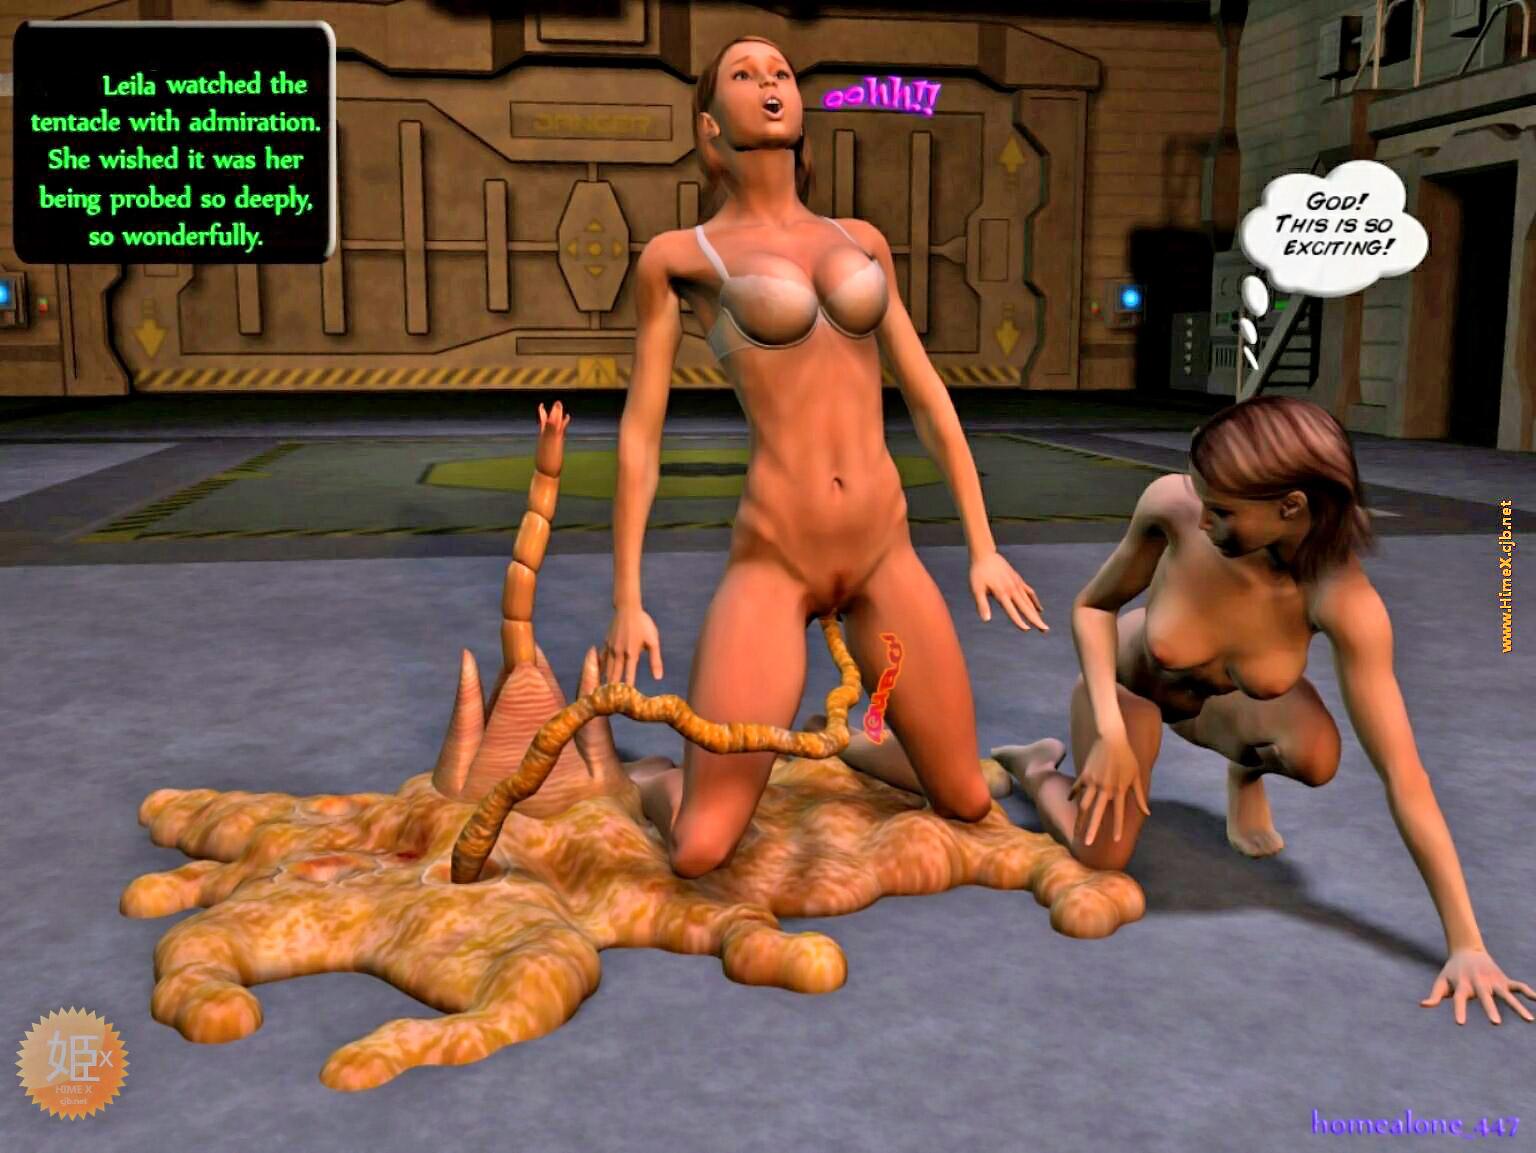 Alien Tentacle Porn Cartoon Comic girls having threesome with tentacled alien tentacle comic